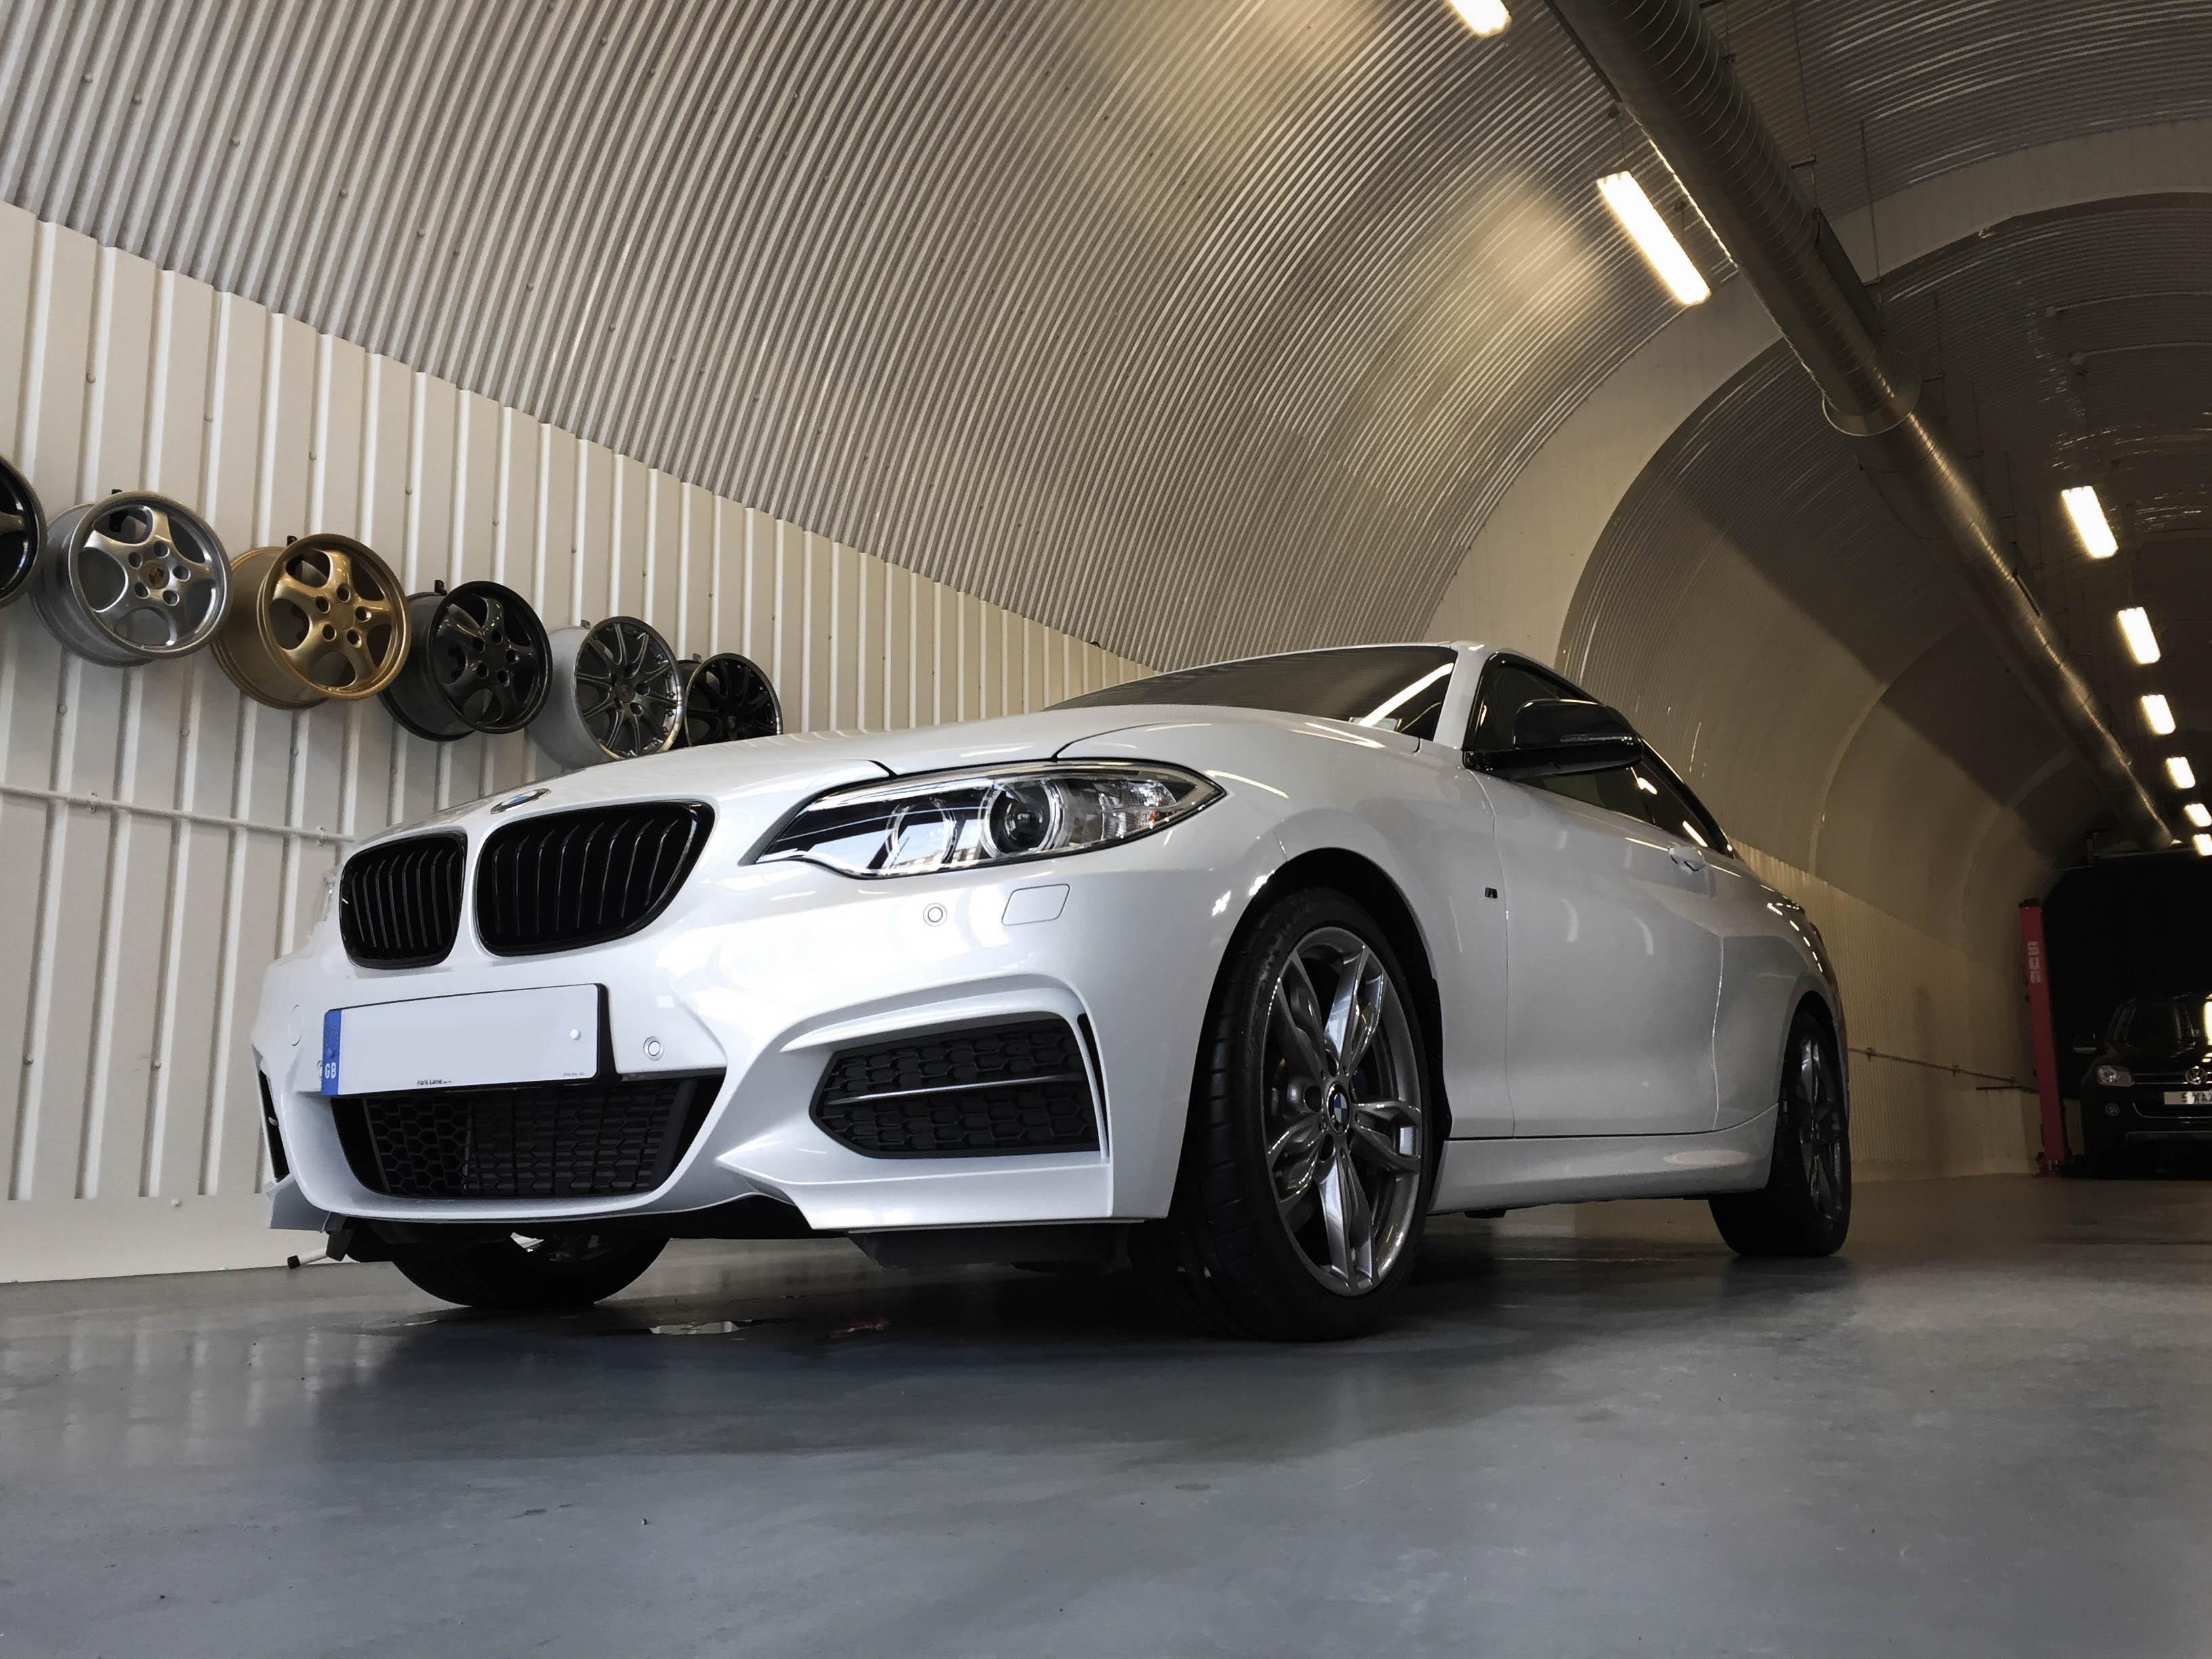 BMW-2series-front-lowangle